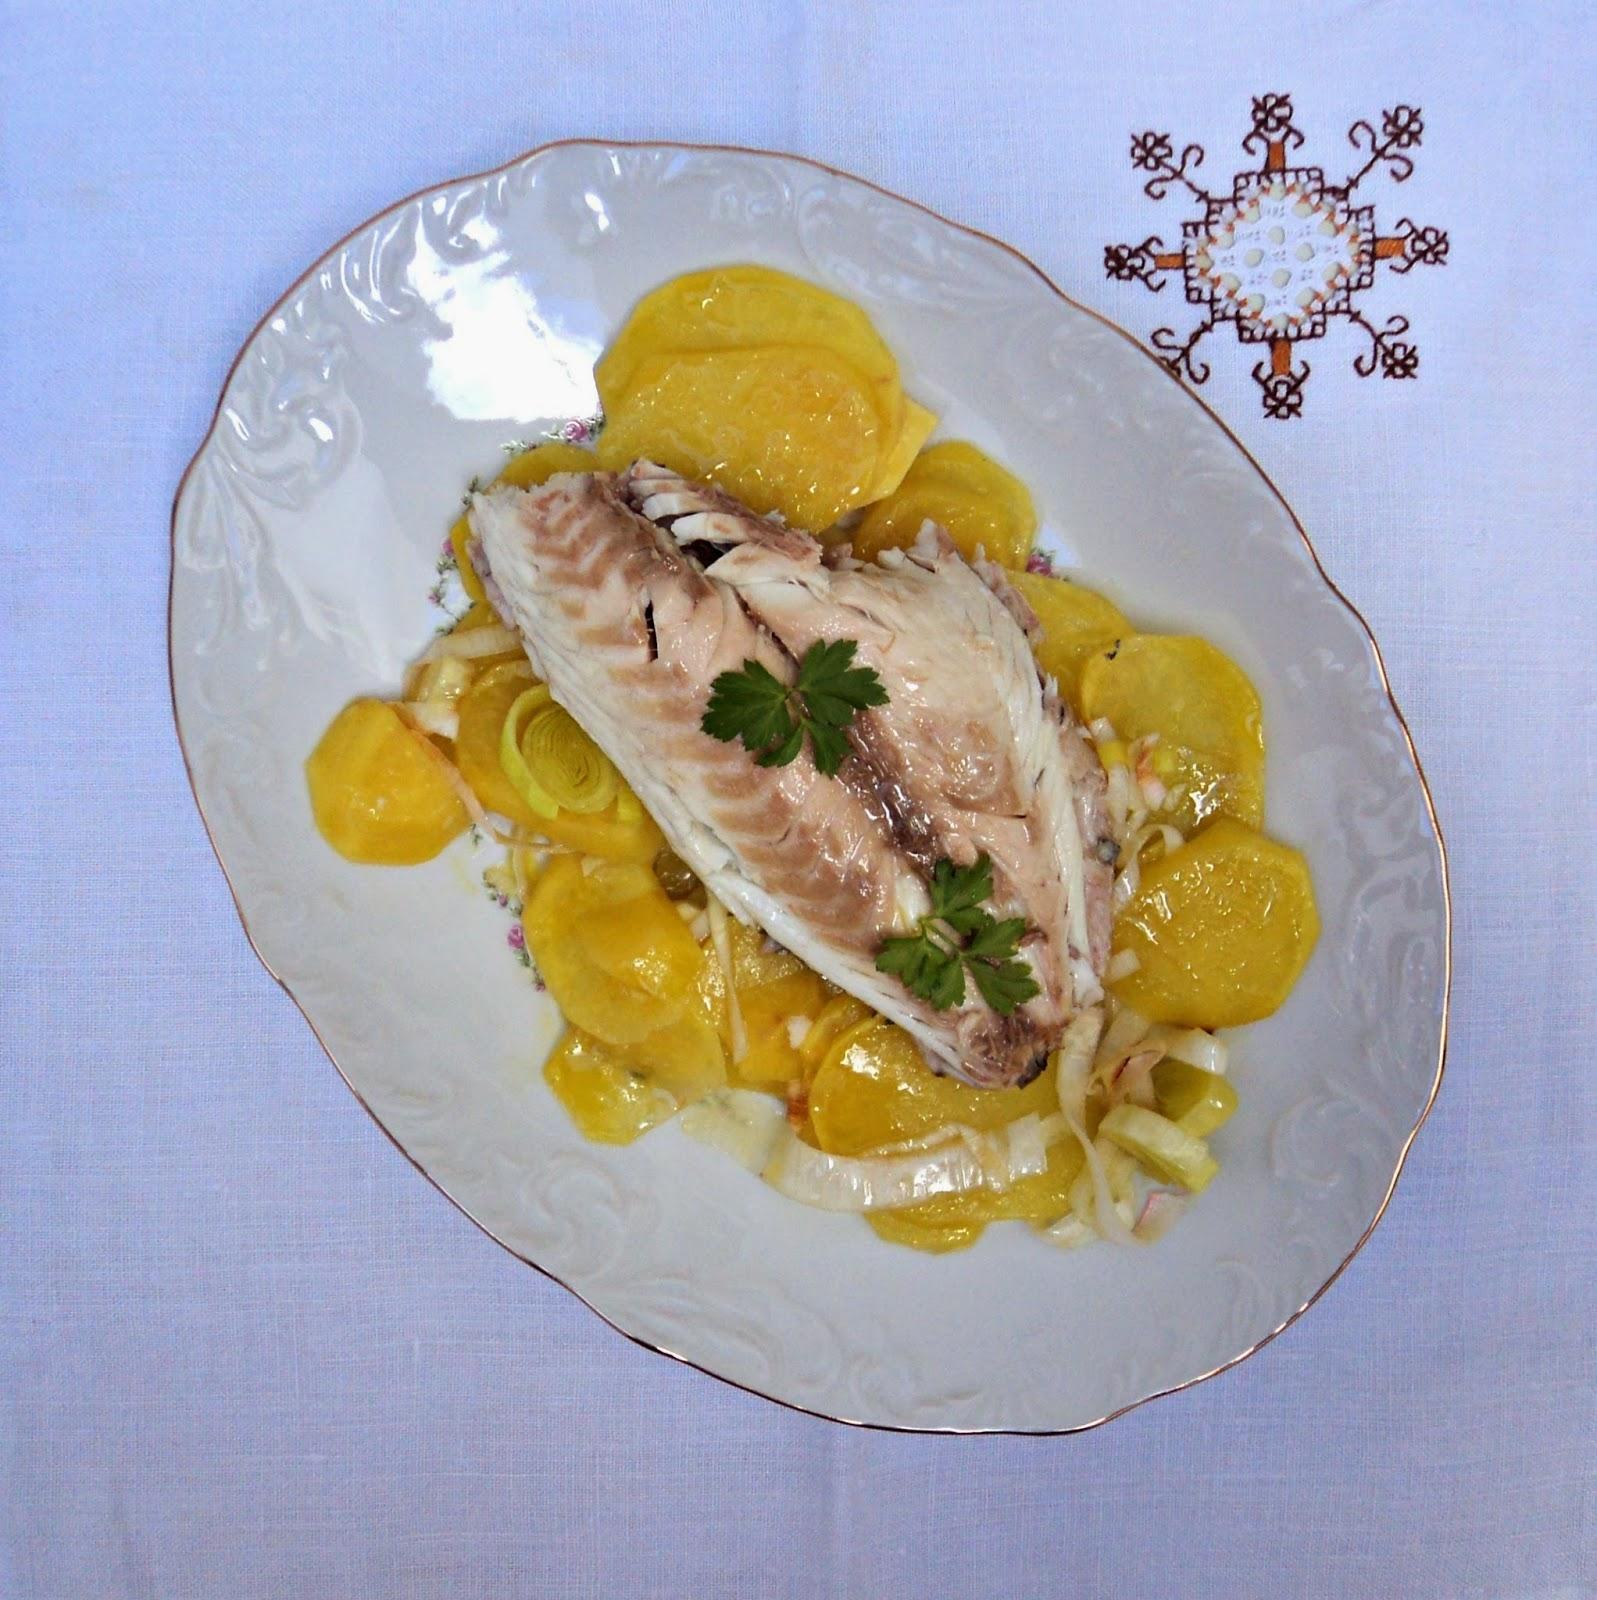 receta casera dorada, patatas, puerro, horno